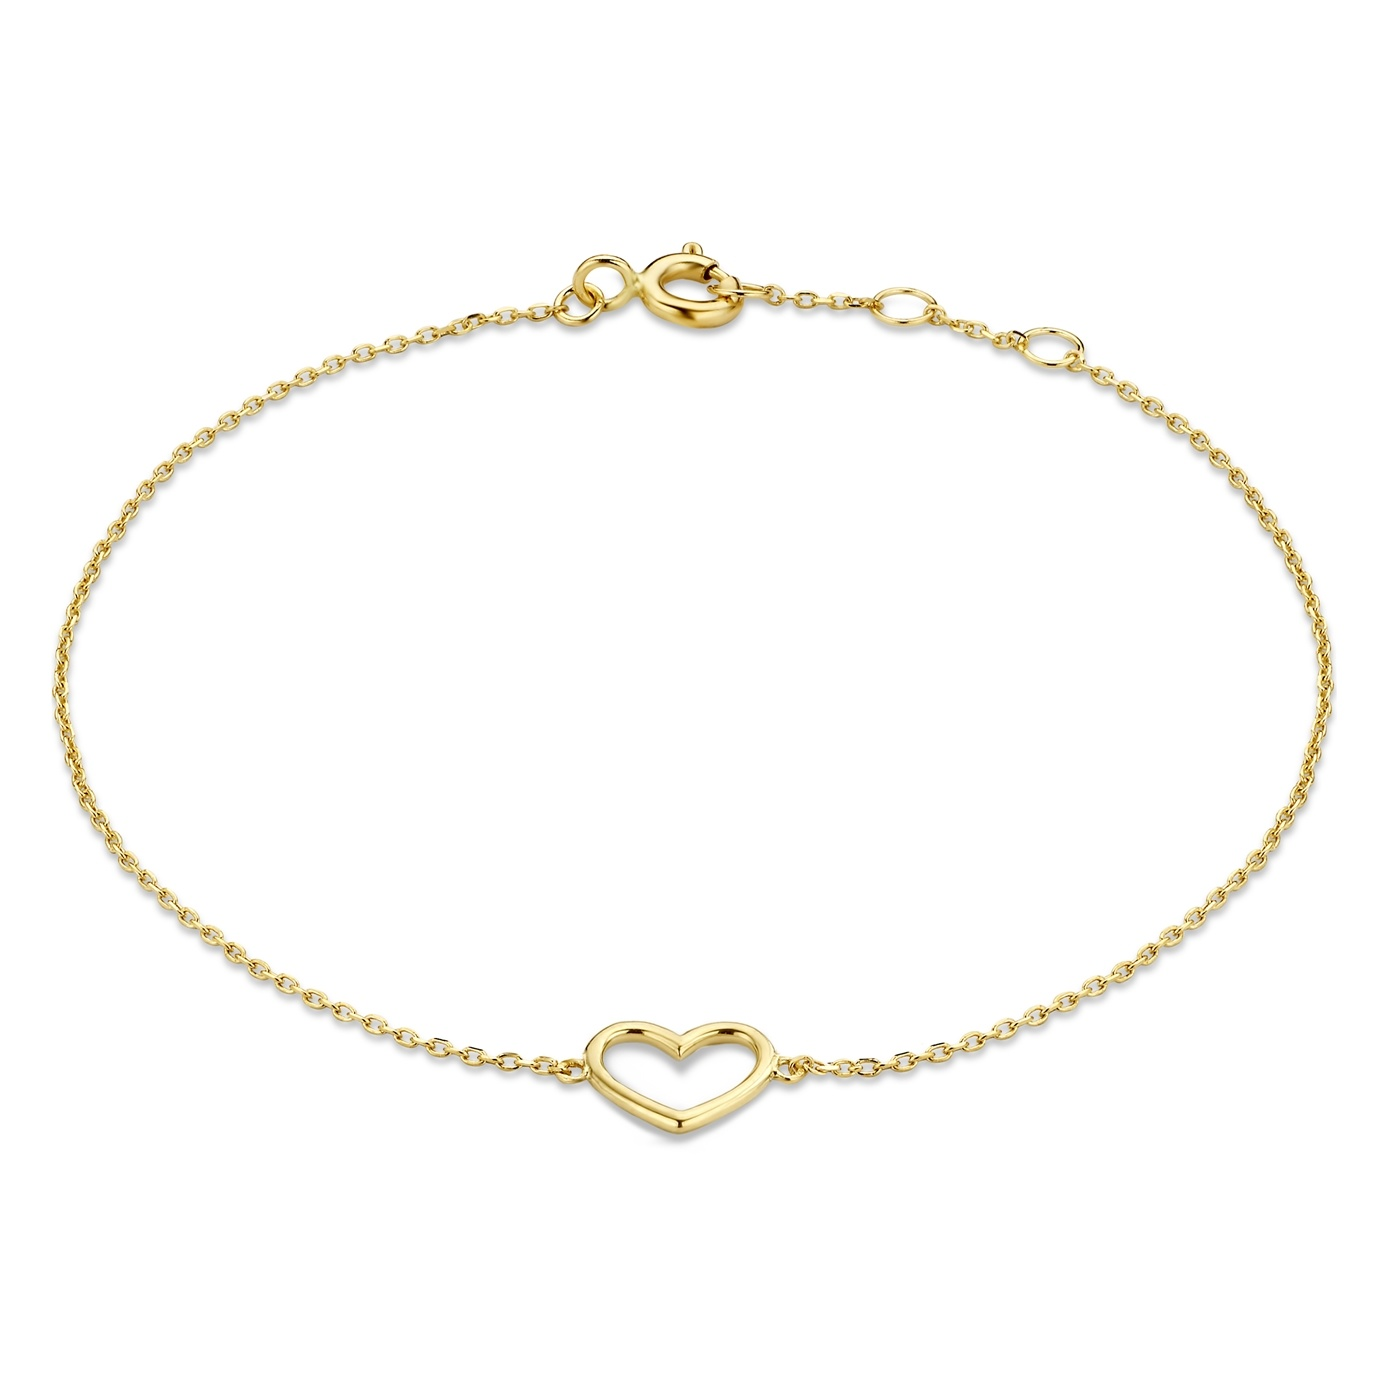 Isabel Bernard Le Marais Alix 14 karaat gouden armband hartje